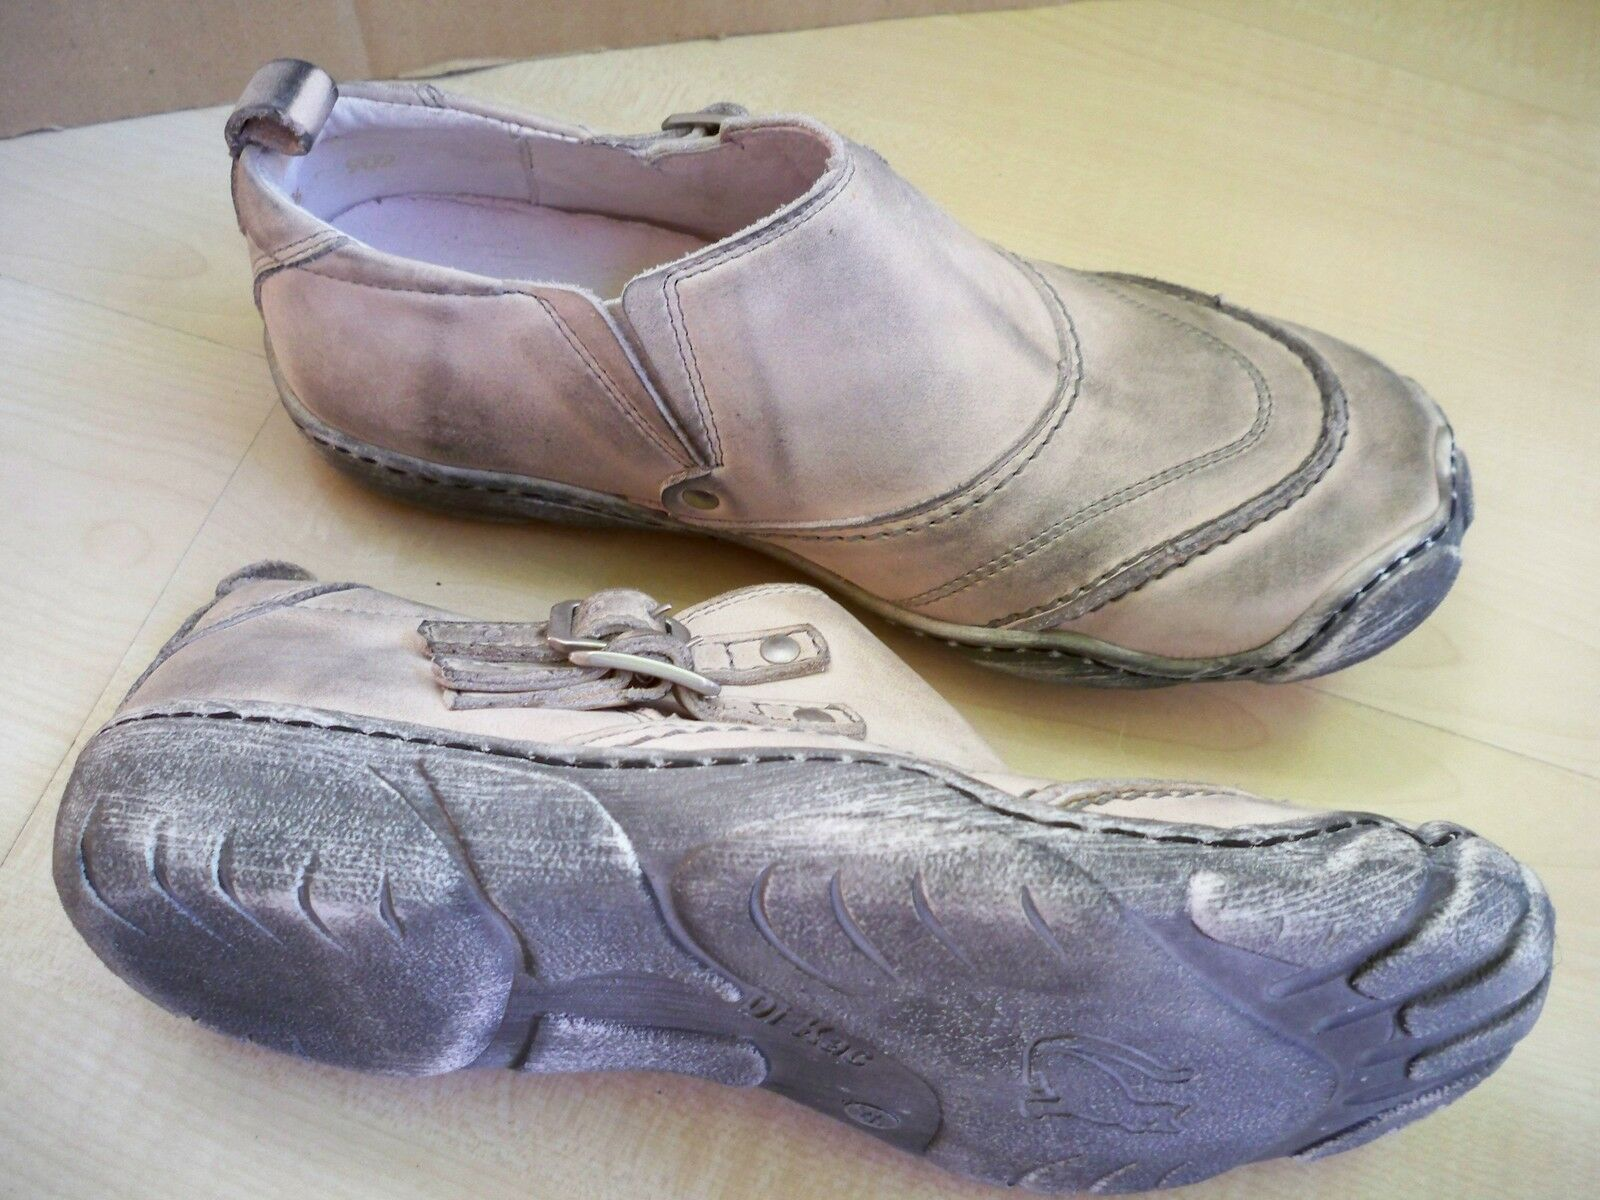 Kacper Schuhe Leder-Halbschuh Slipper 36/2223 mit herausnehmbarer Decksohle